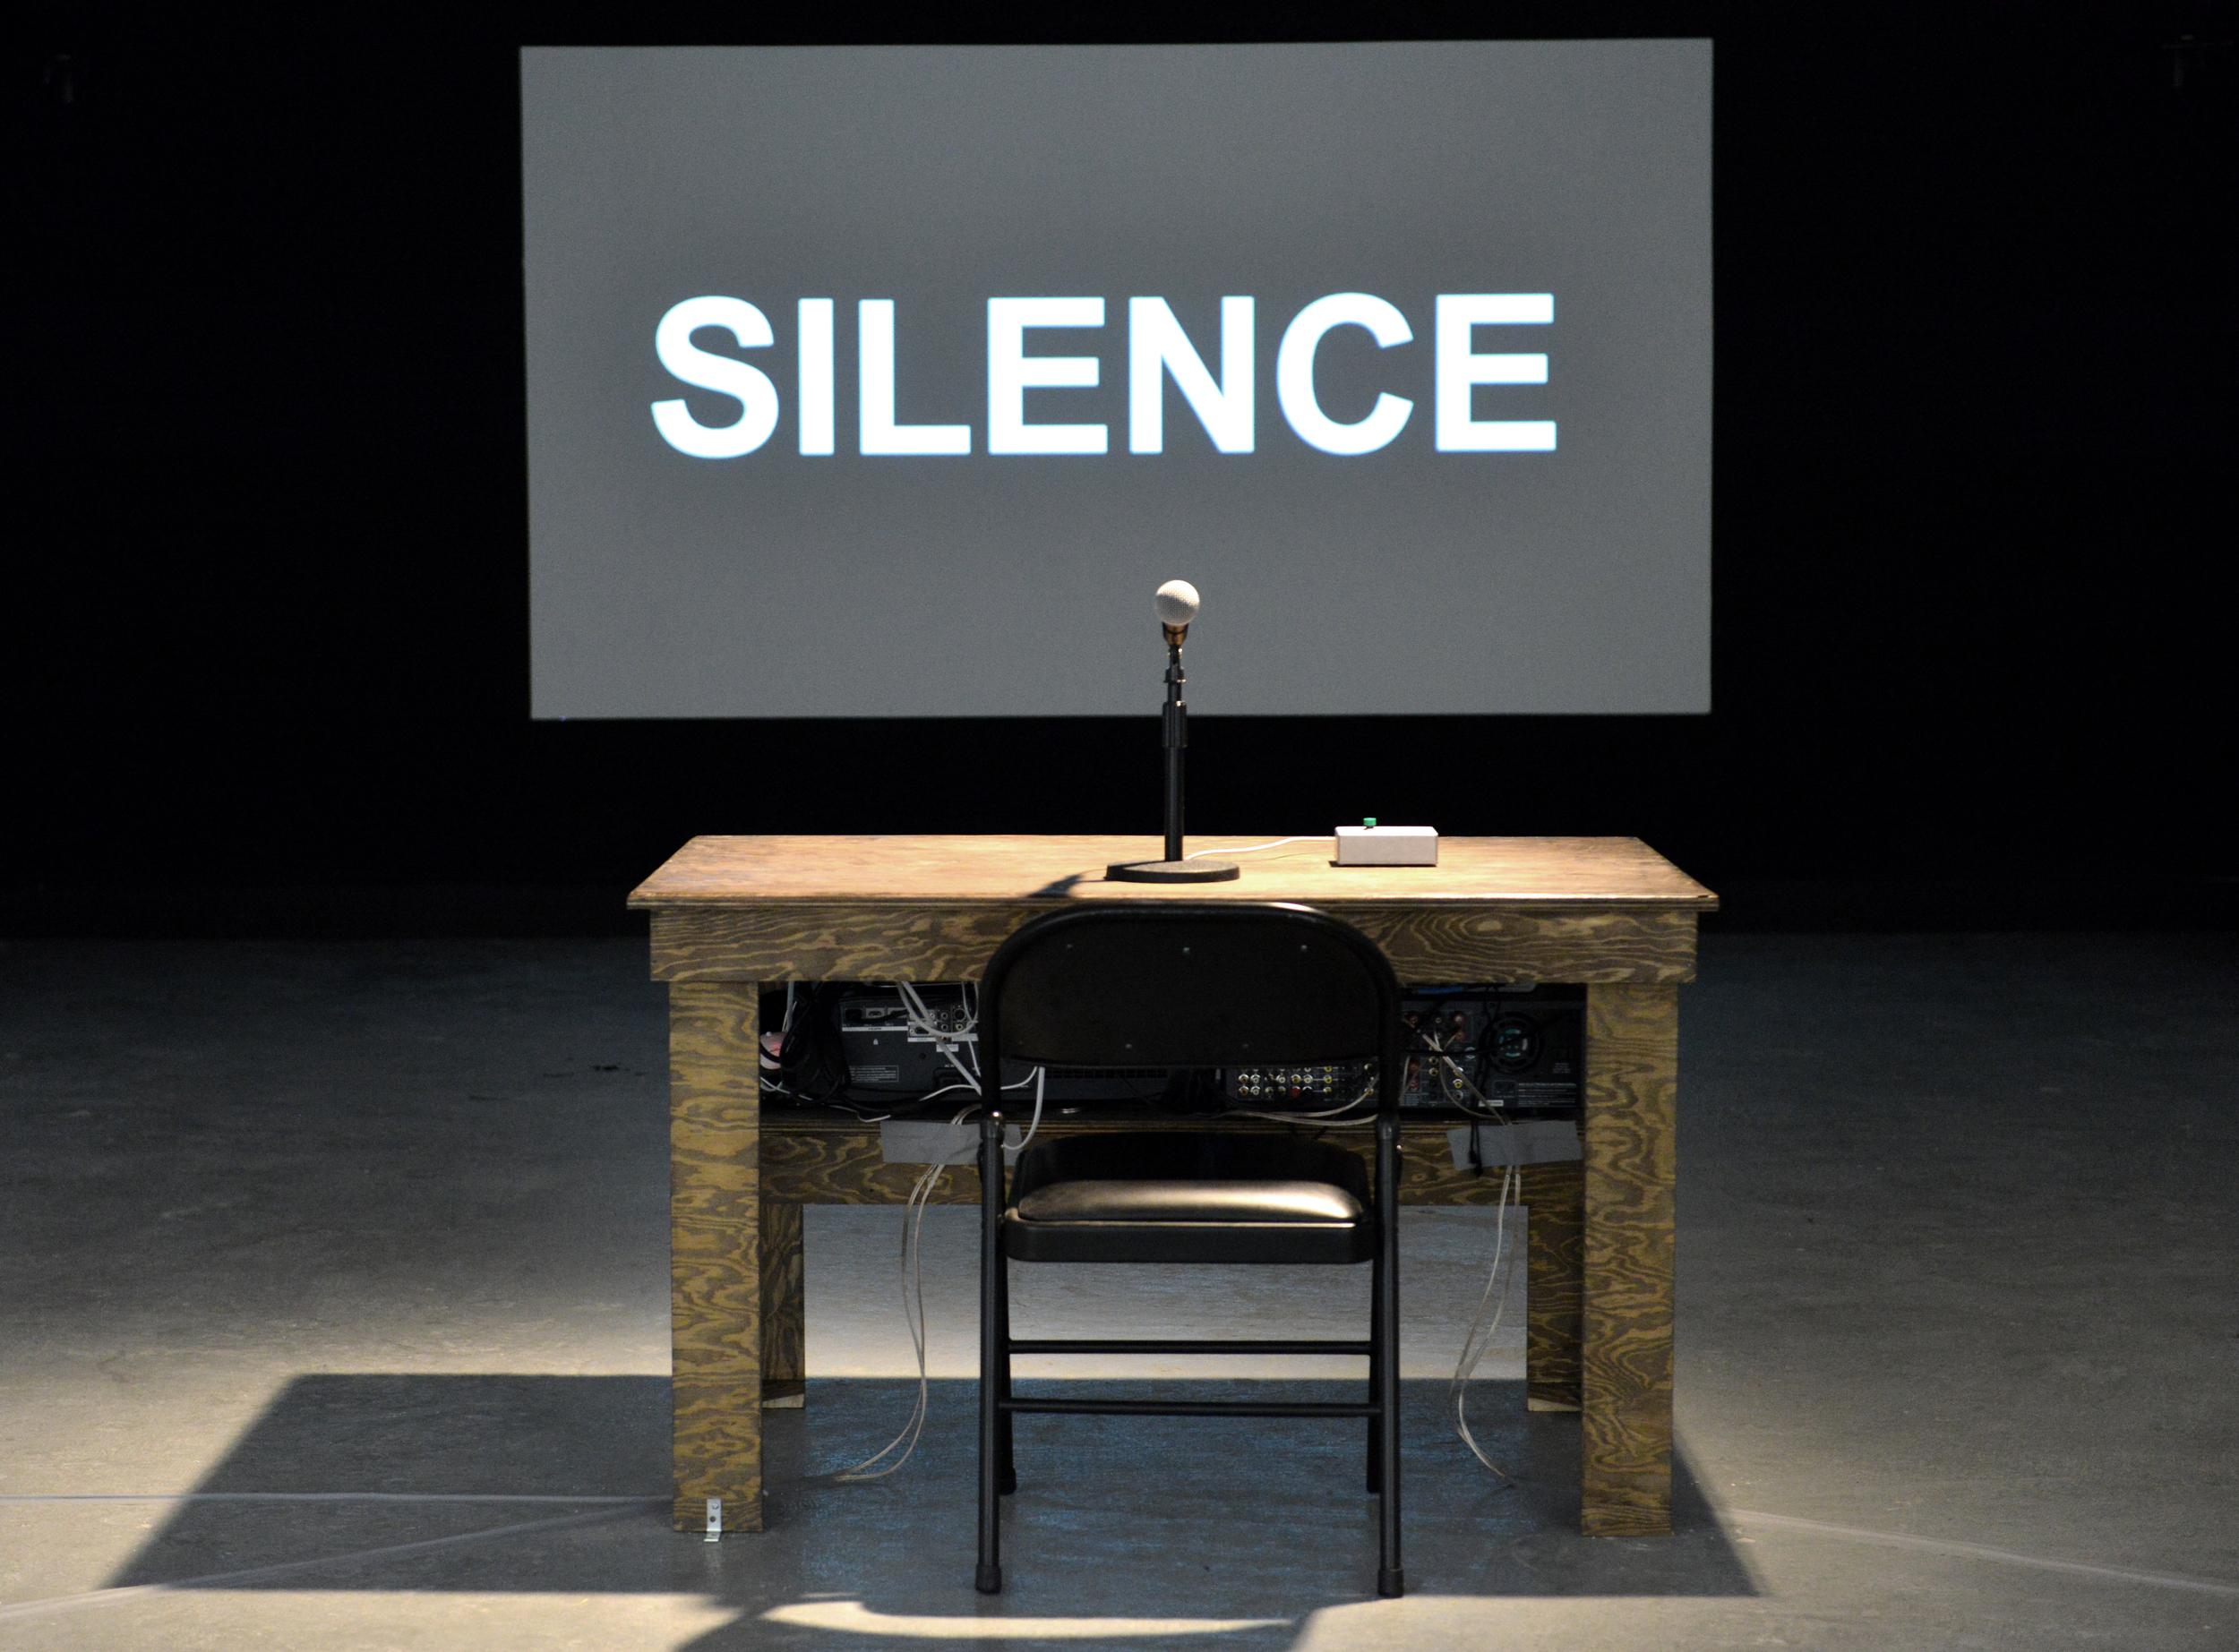 Silentcitizen_silence.jpg